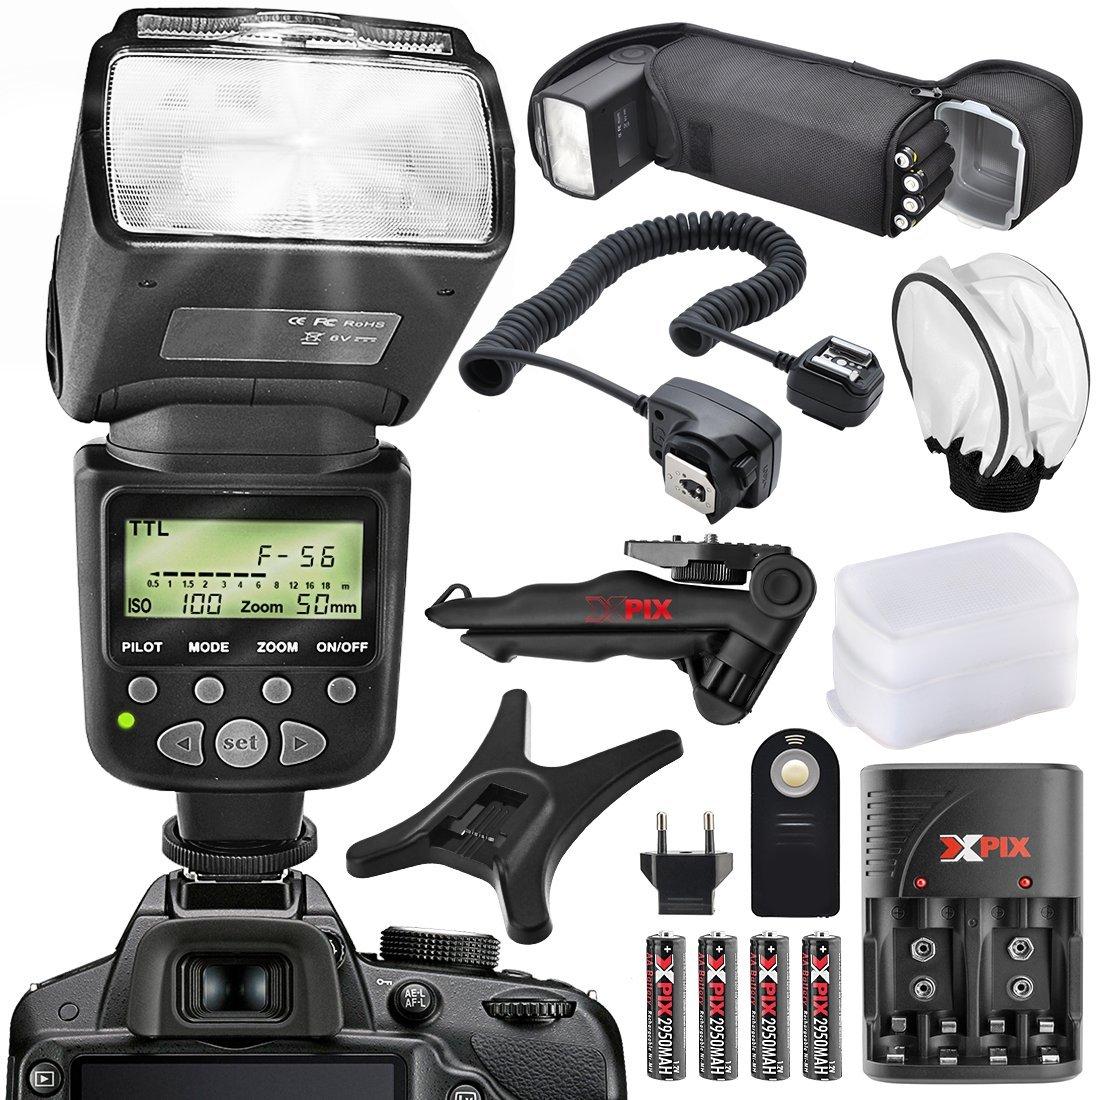 XPIX High Power Auto-Focus Digital SLR Flash for Nikon Camera with Deluxe Accessory Bundle